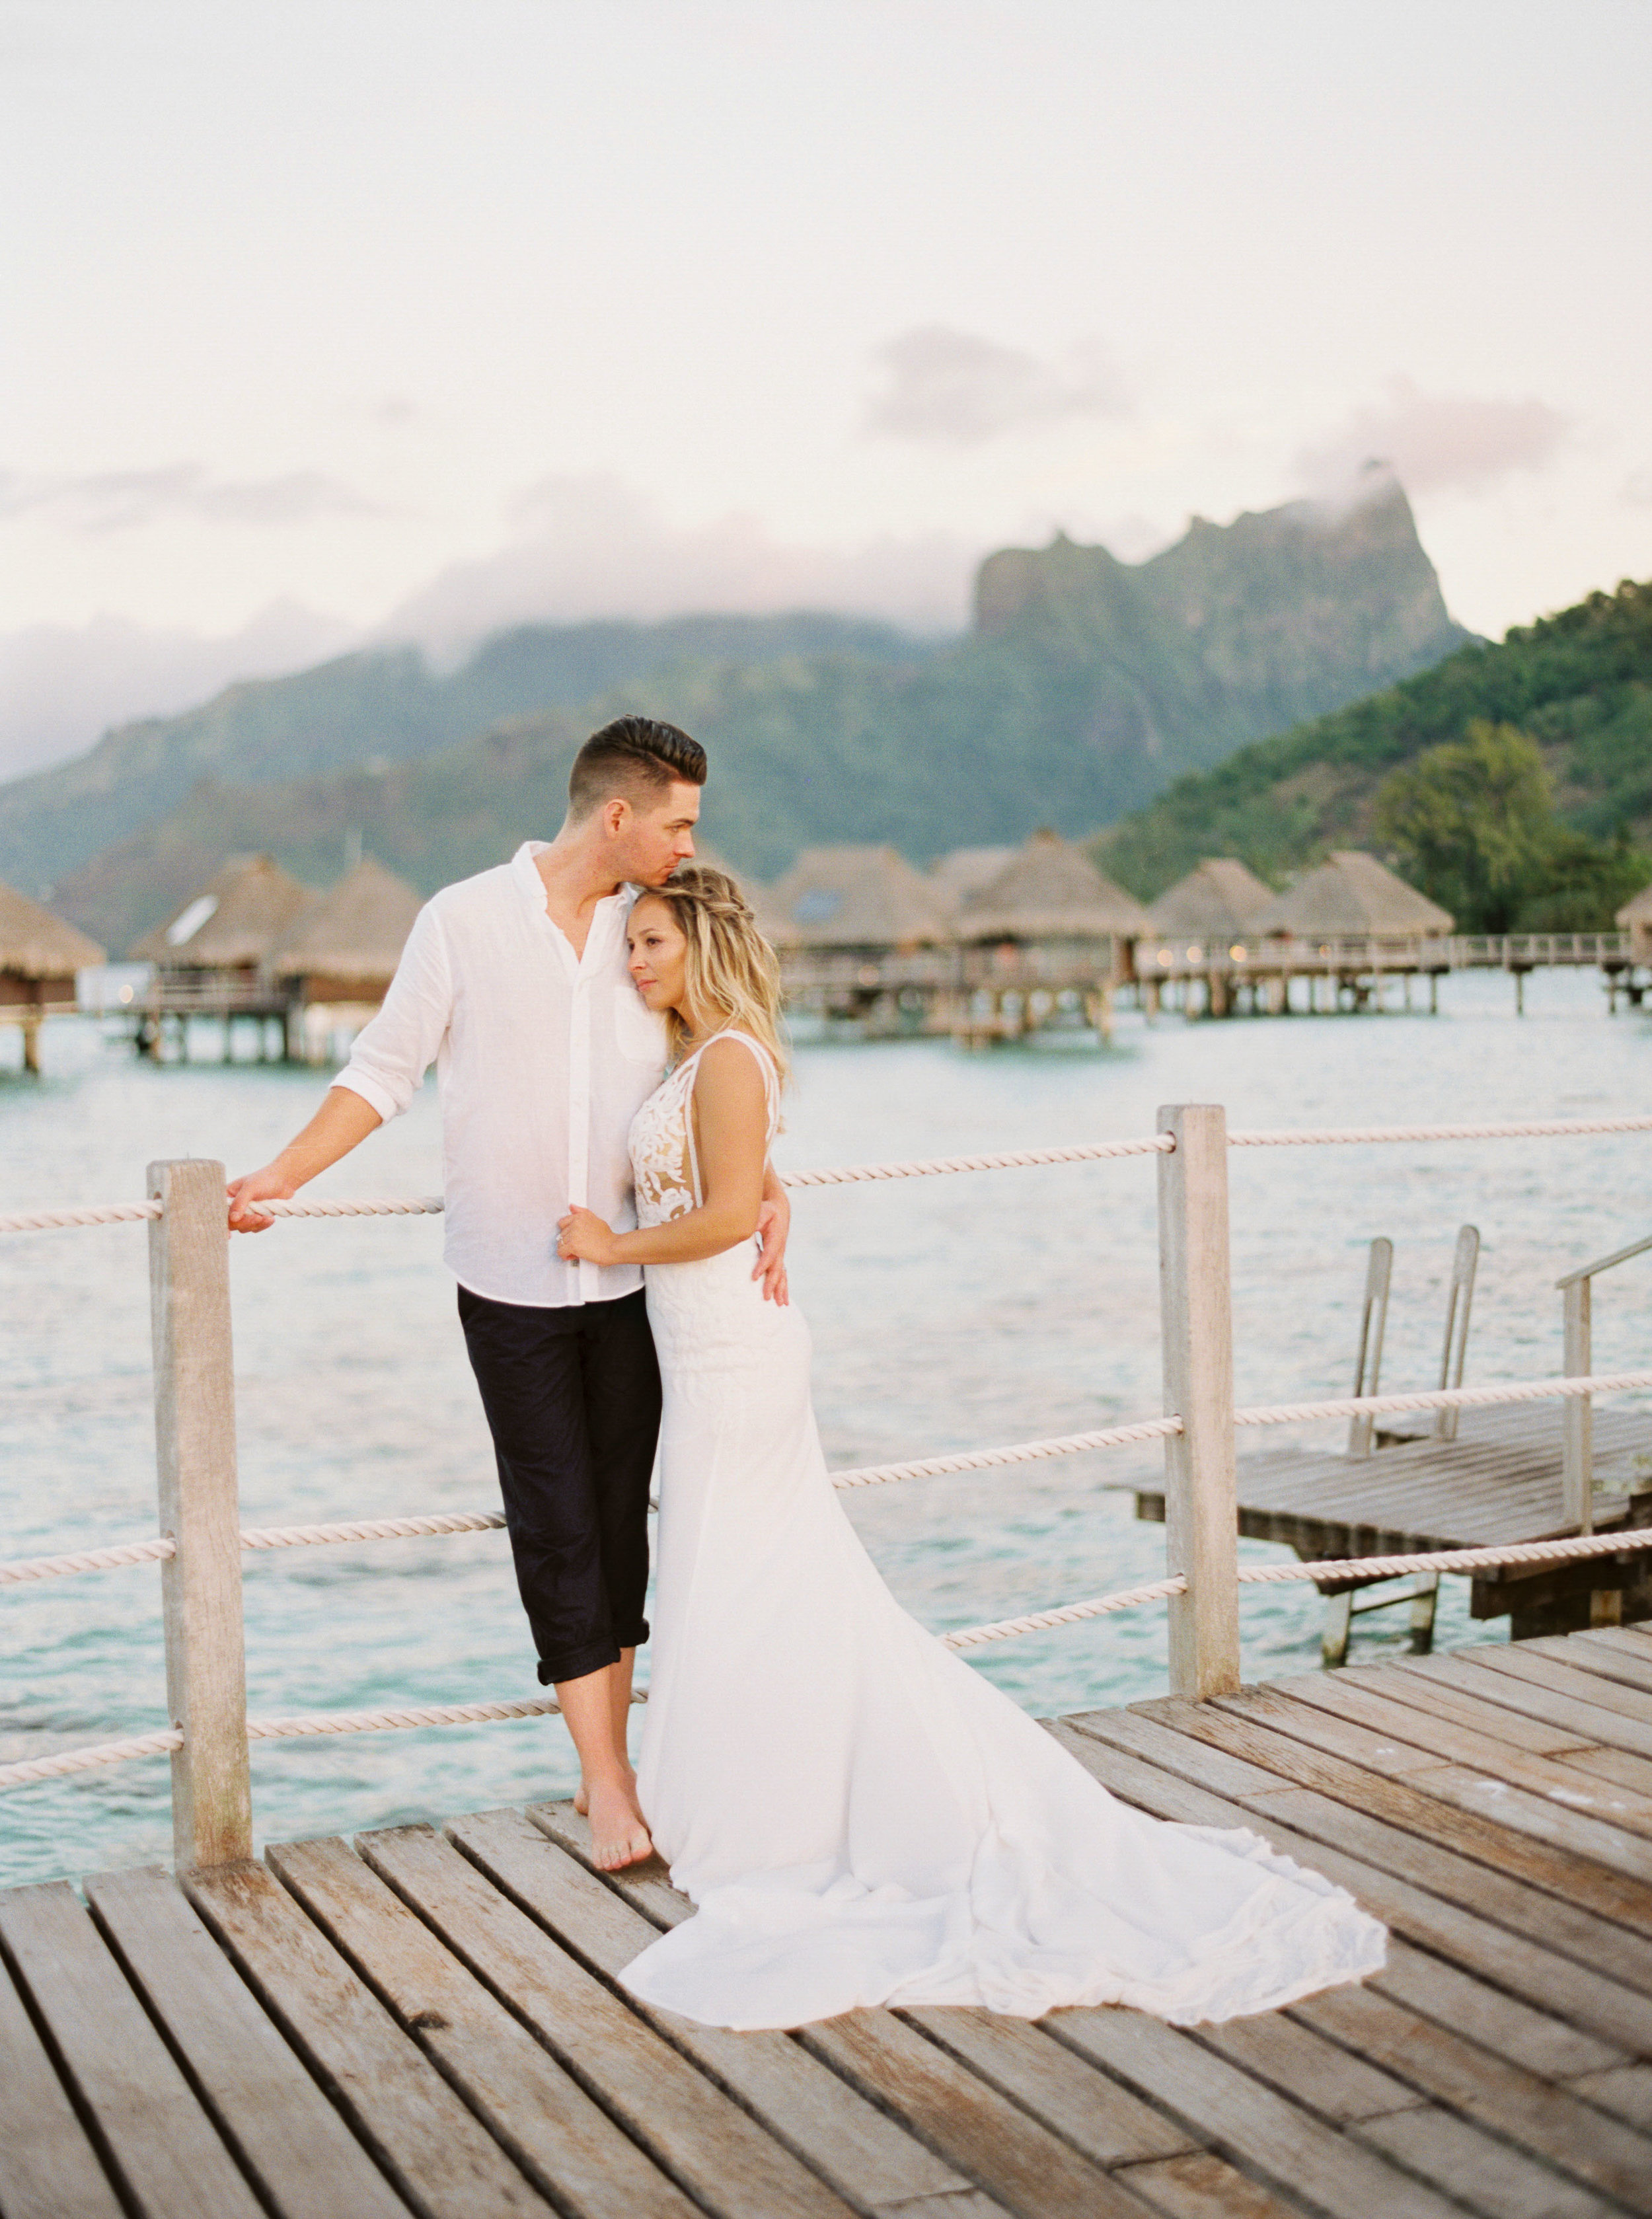 Moorea_Wedding_Elopement_Photographer_Videographer_148.jpg